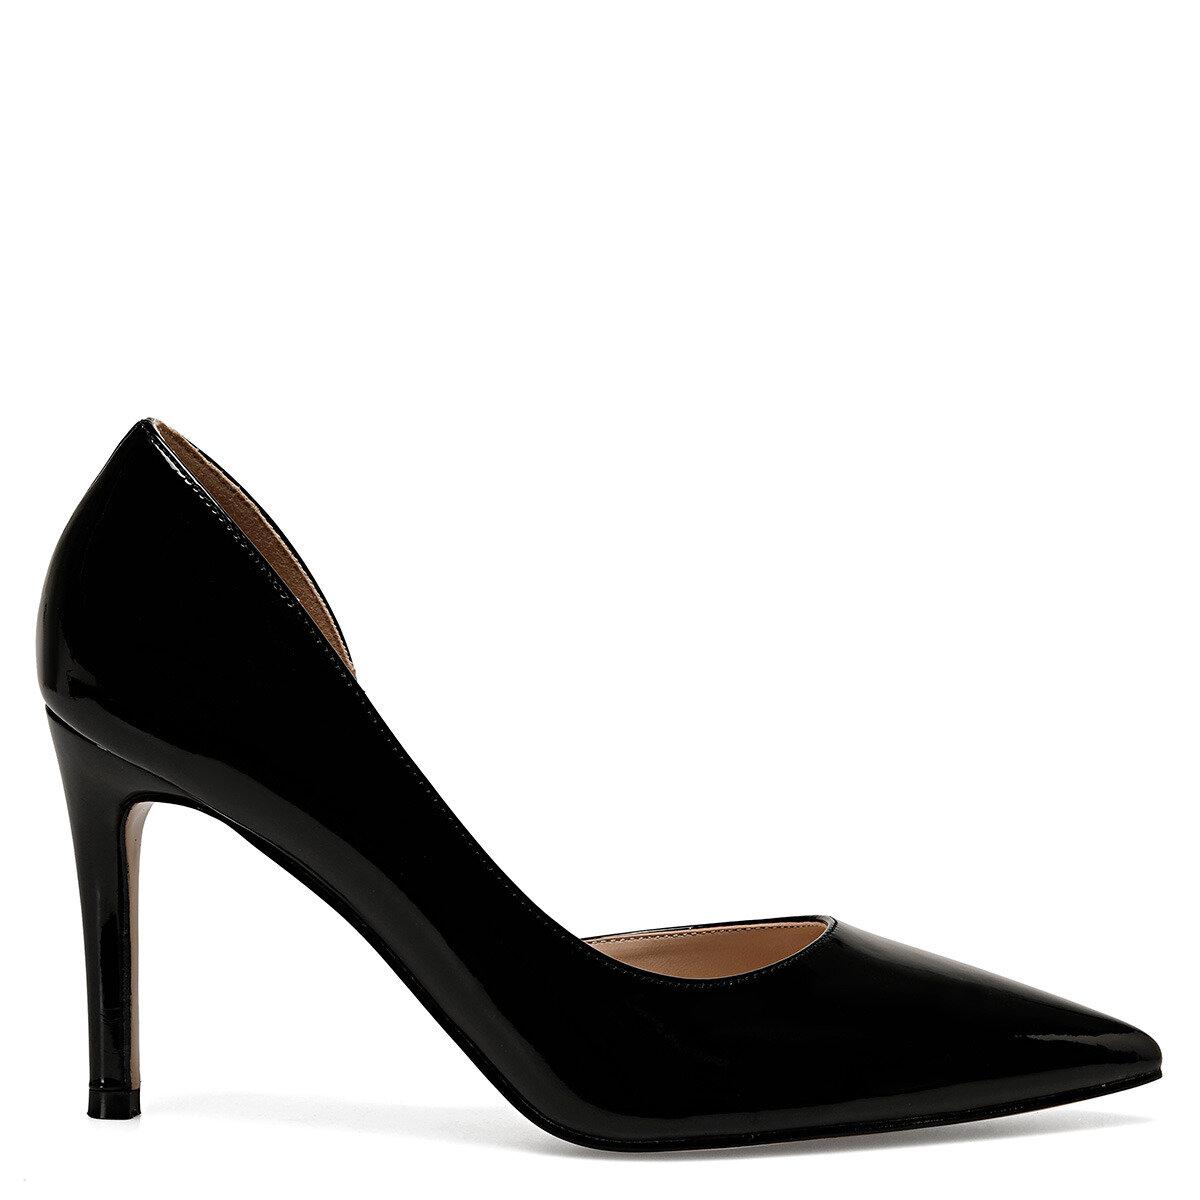 TIANA2 Siyah Kadın Stiletto